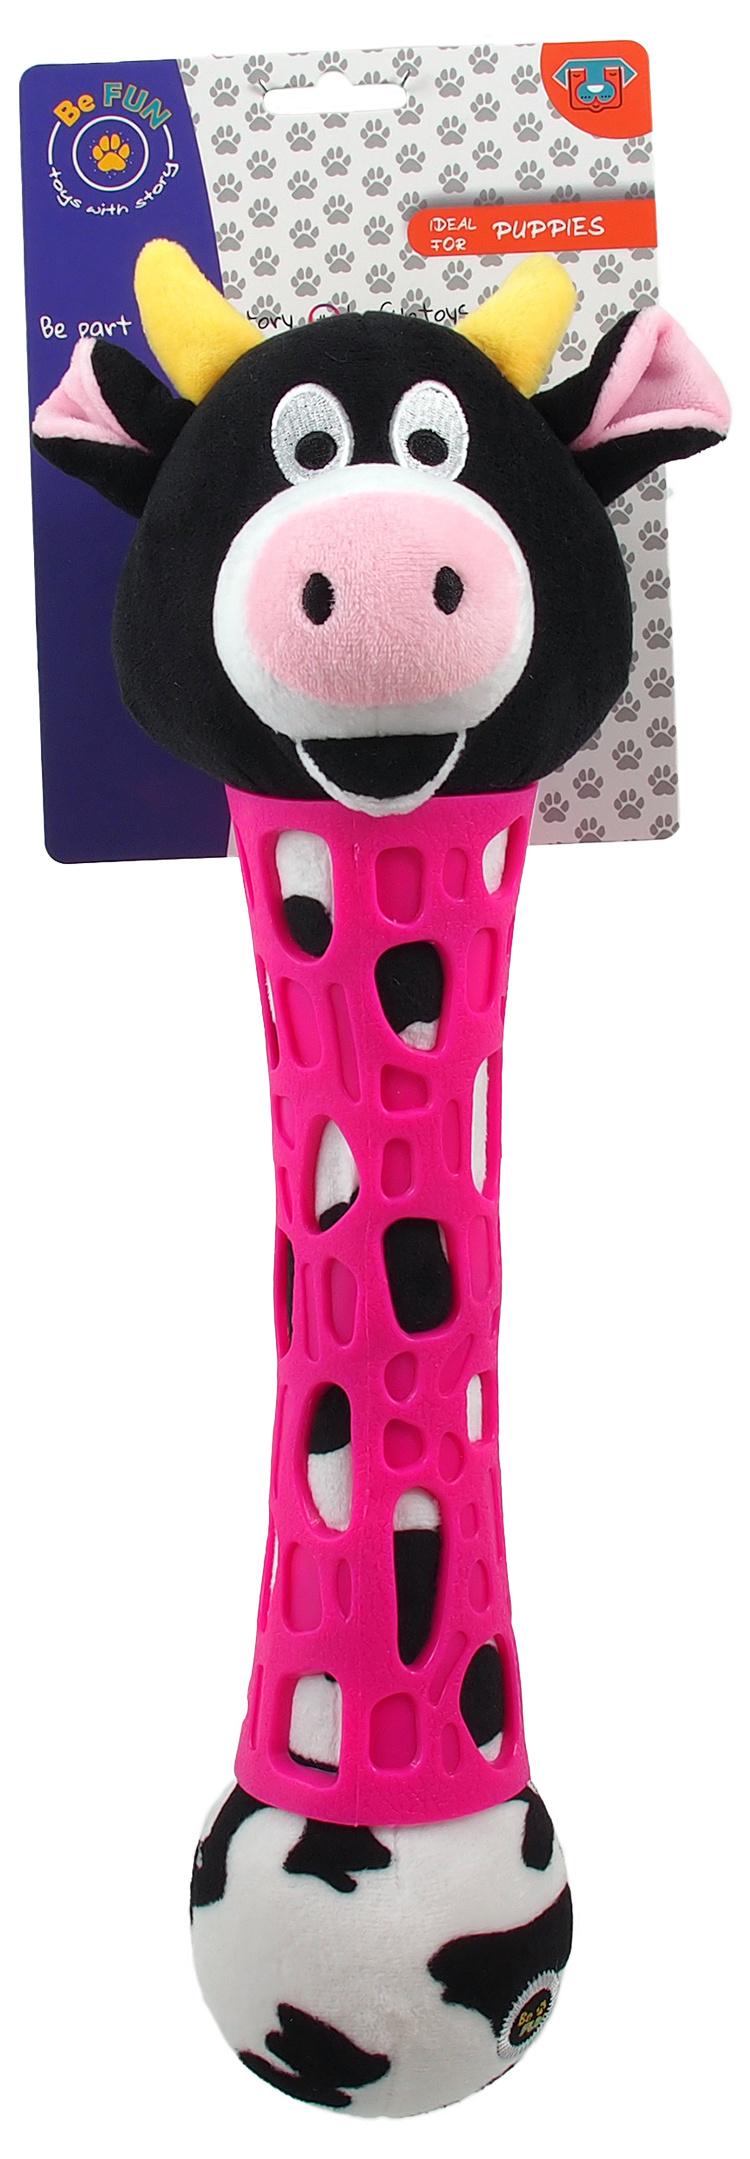 BeFun hračka TPR plyšová kravička 39 cm